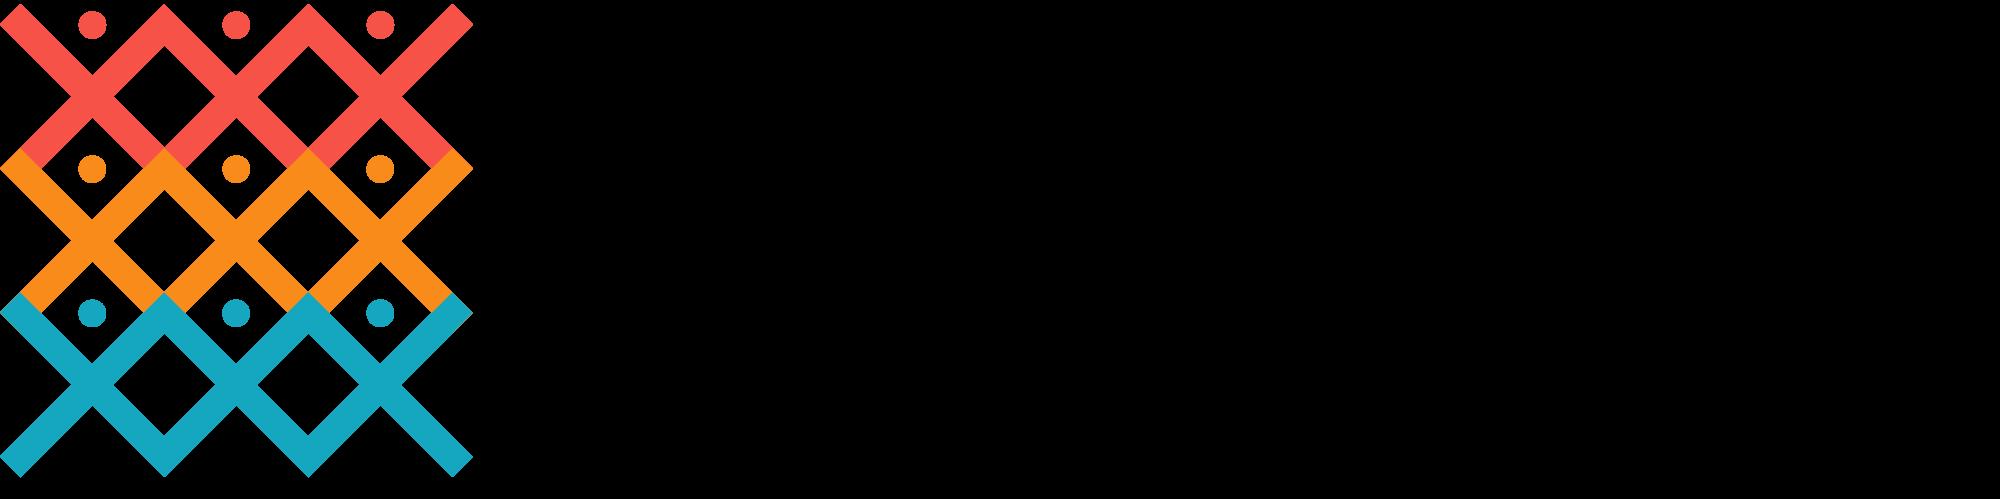 M2030